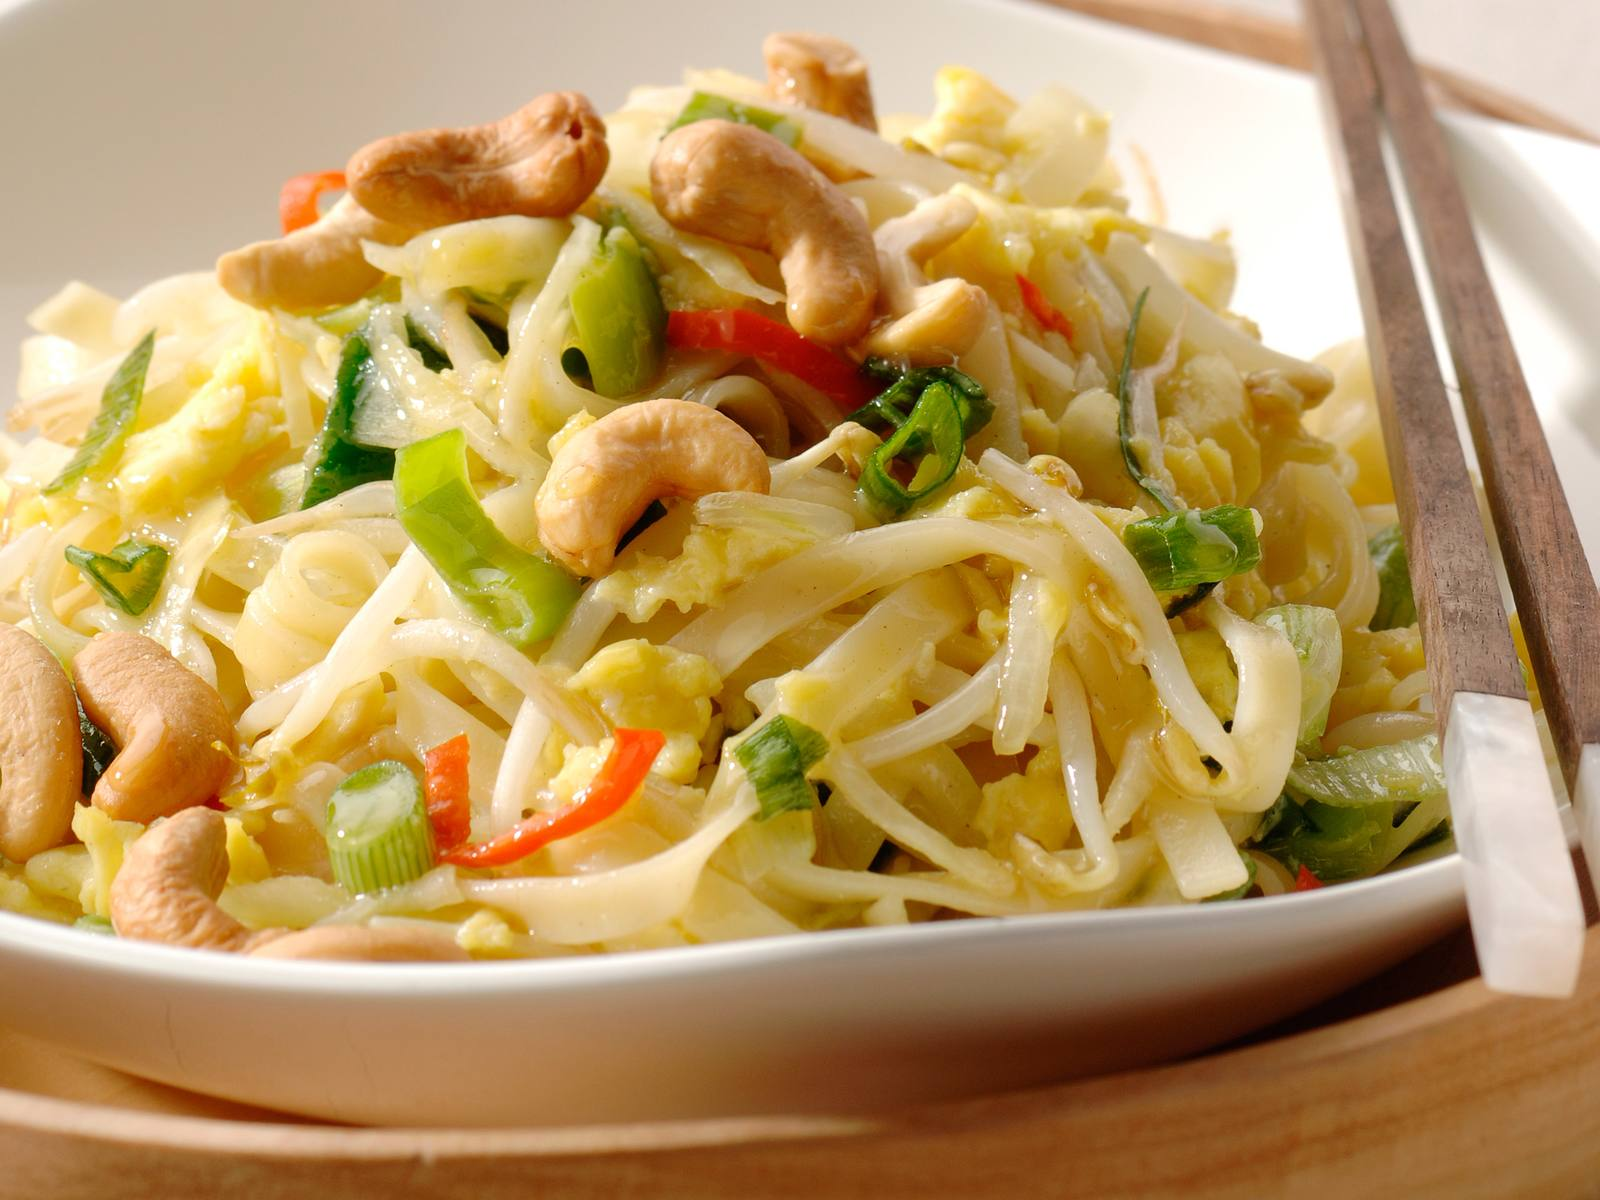 Thaise knoflook en koriandermie met roerei en cashewnoten